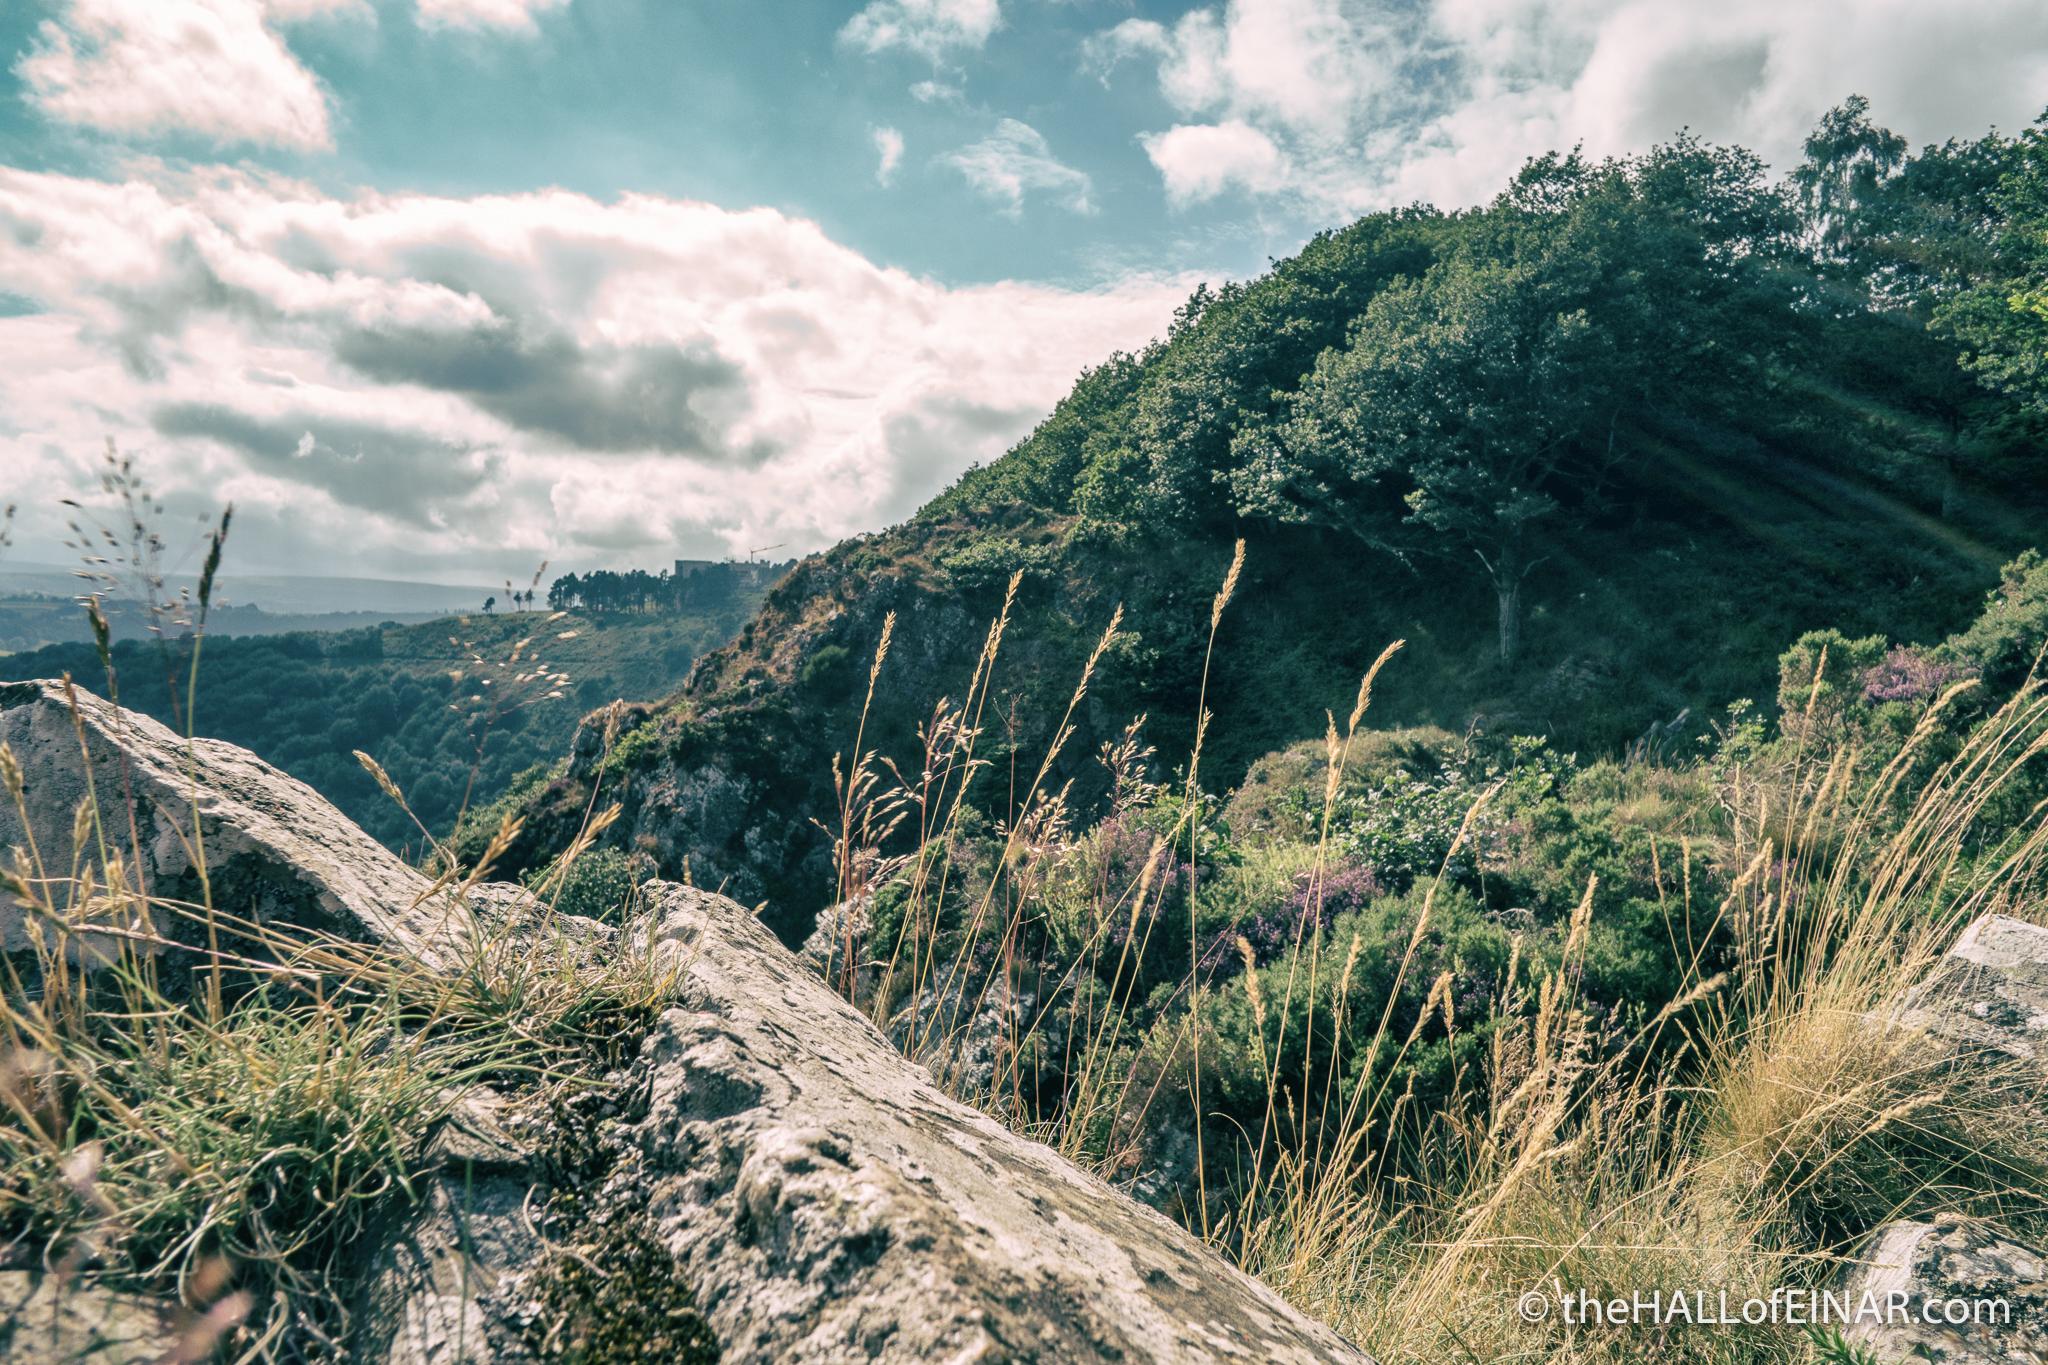 Castle Drogo - The Hall of Einar - photograph (c) David Bailey (not the)